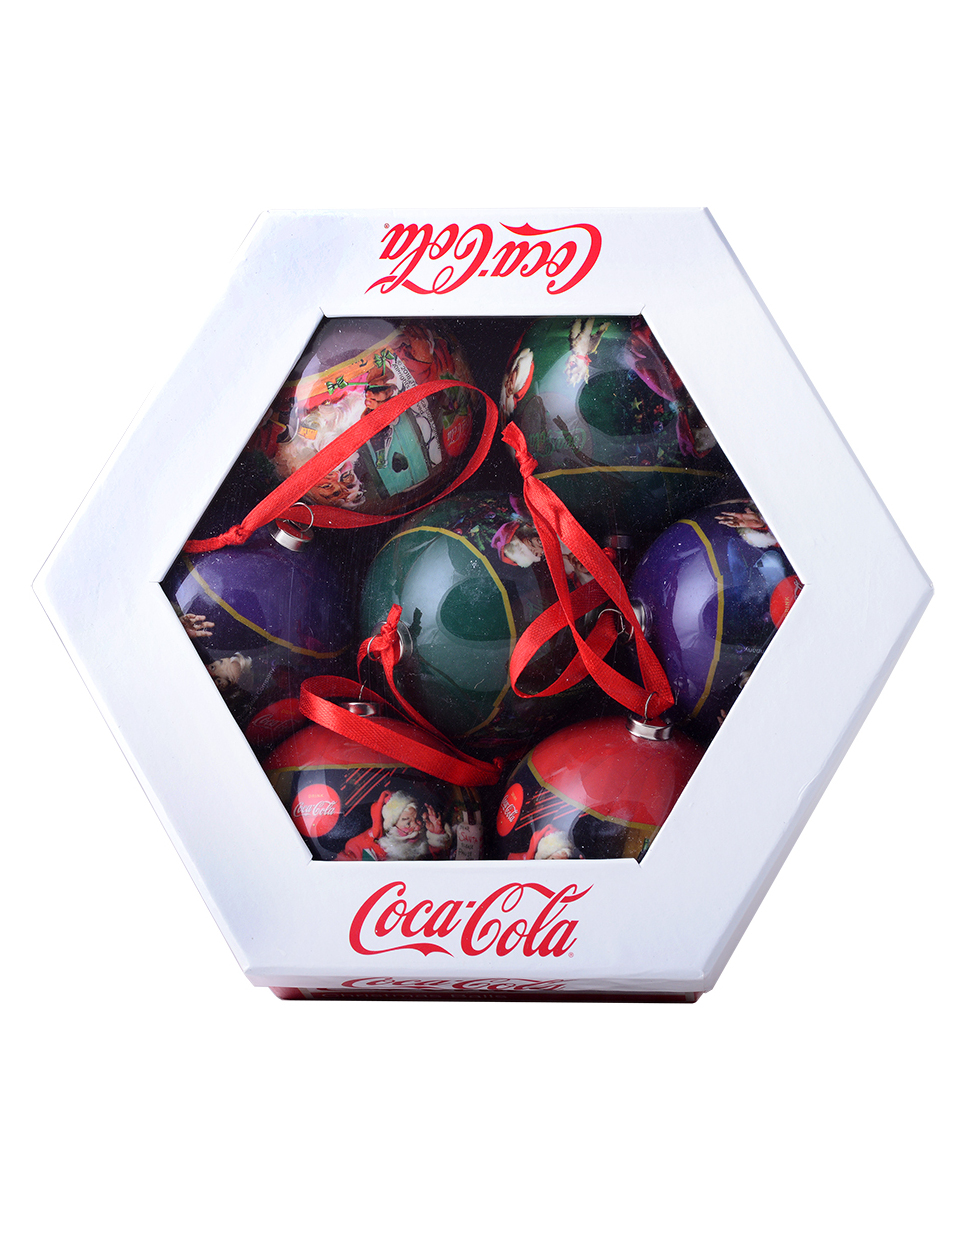 Günstige Christbaumkugeln.Coca Cola Christbaumkugeln 7 Stück In Geschenkbox Bunt 7 5cm